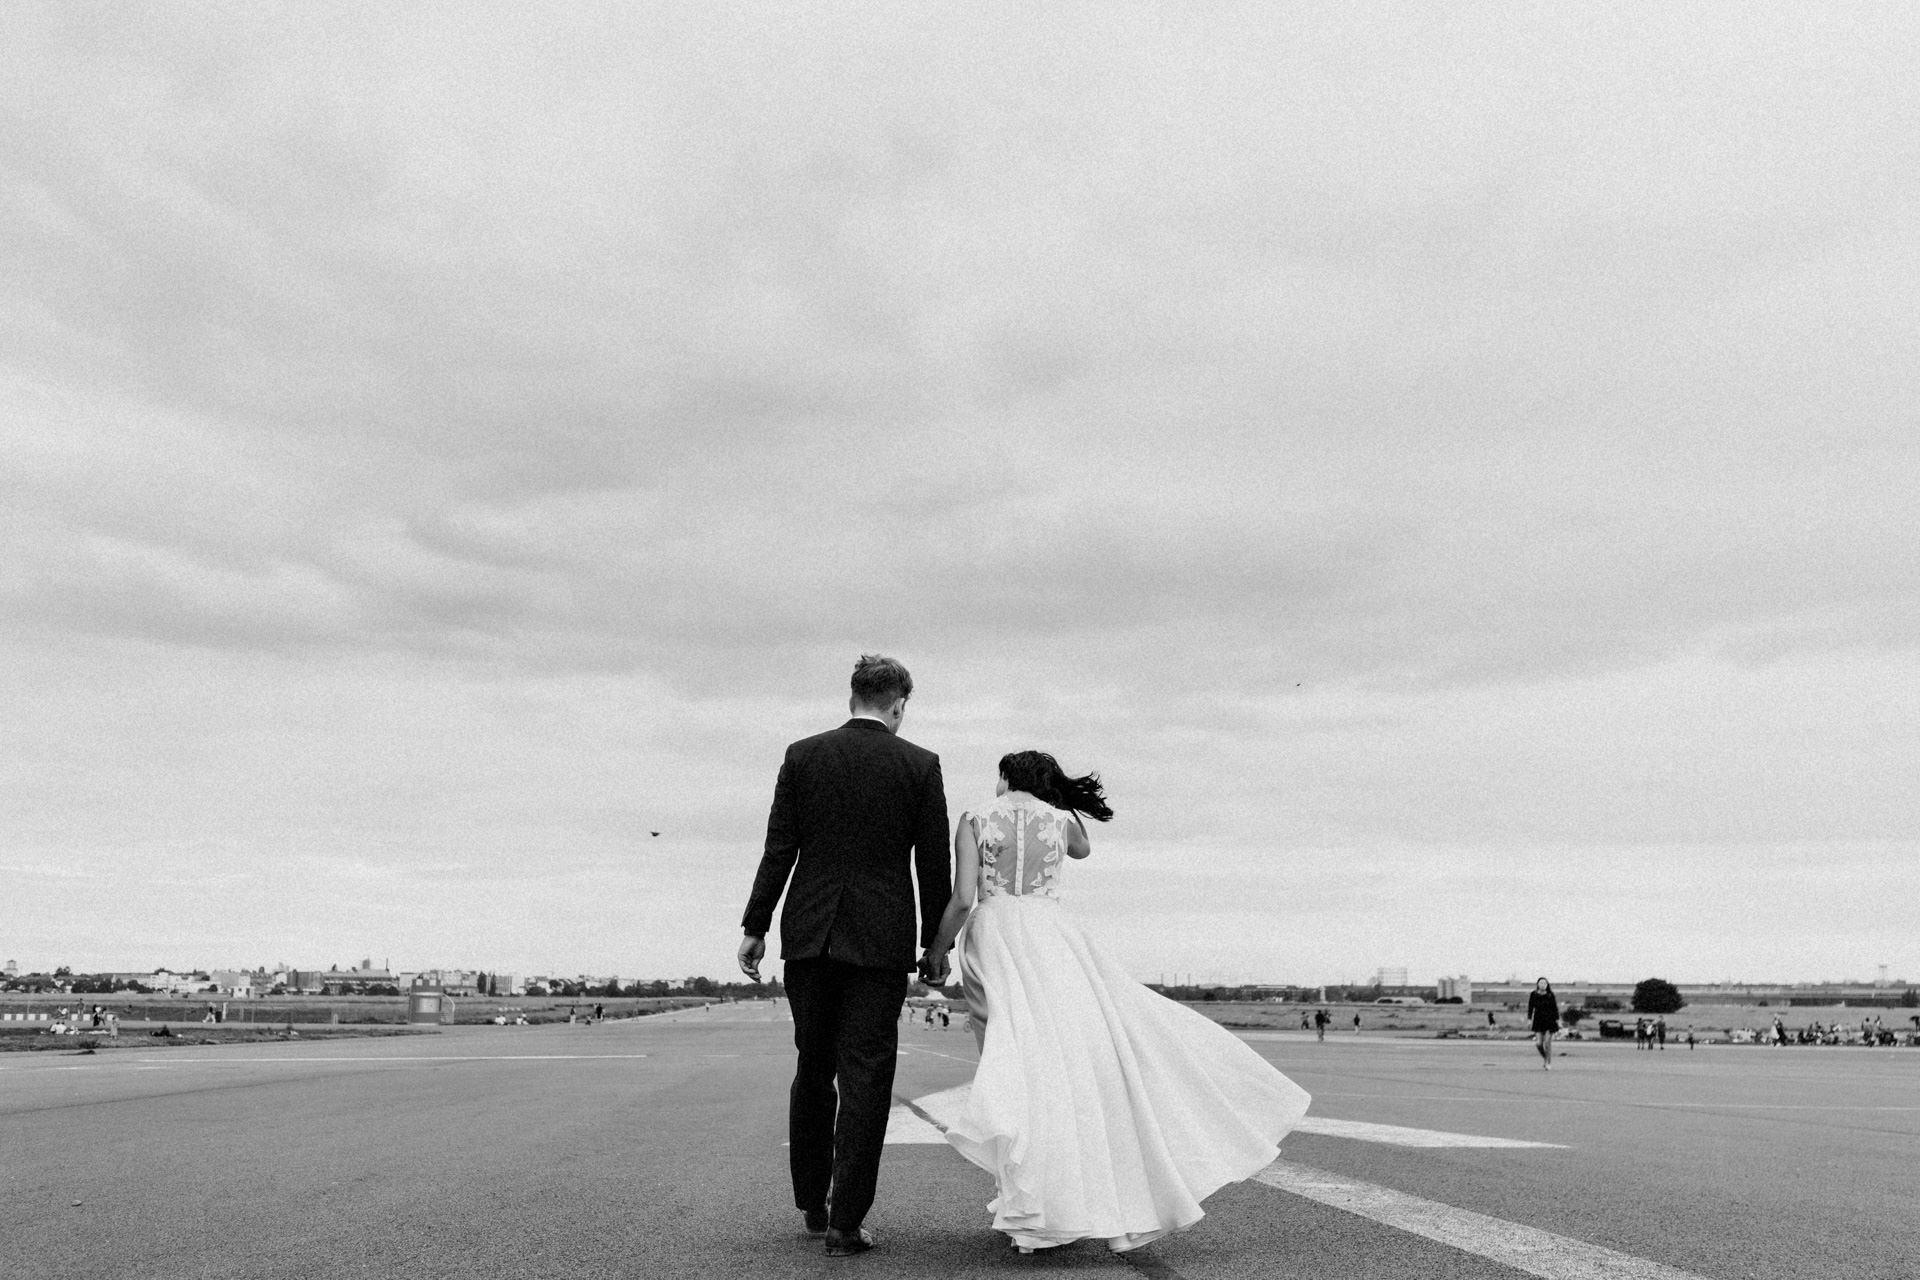 hochzeit berlin neukölln heiraten paarfoto